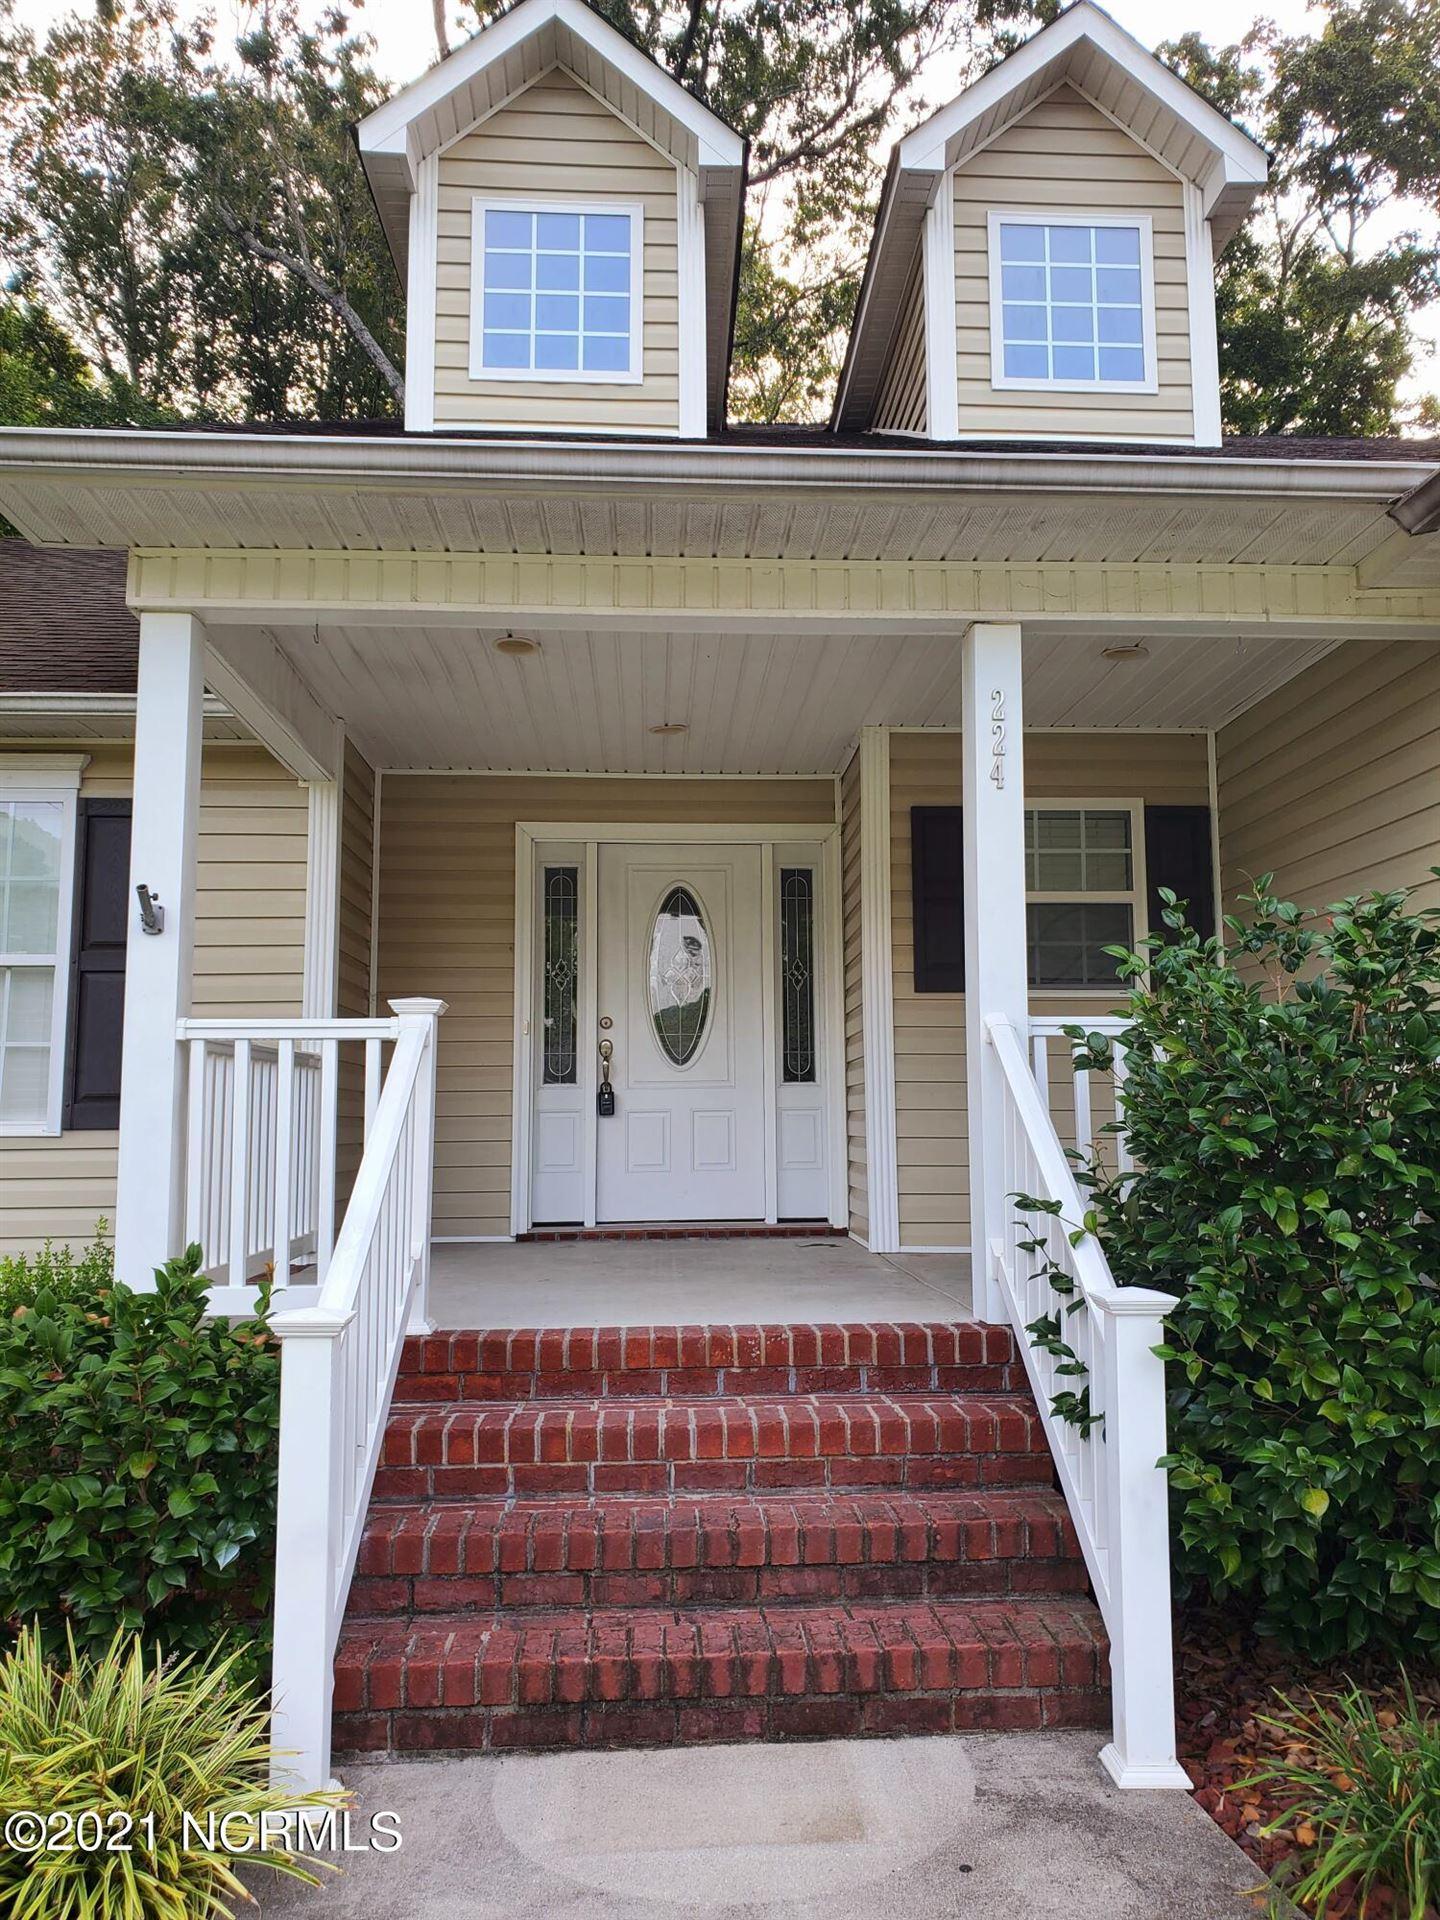 Photo of 224 Edgewood Drive, Jacksonville, NC 28546 (MLS # 100291646)